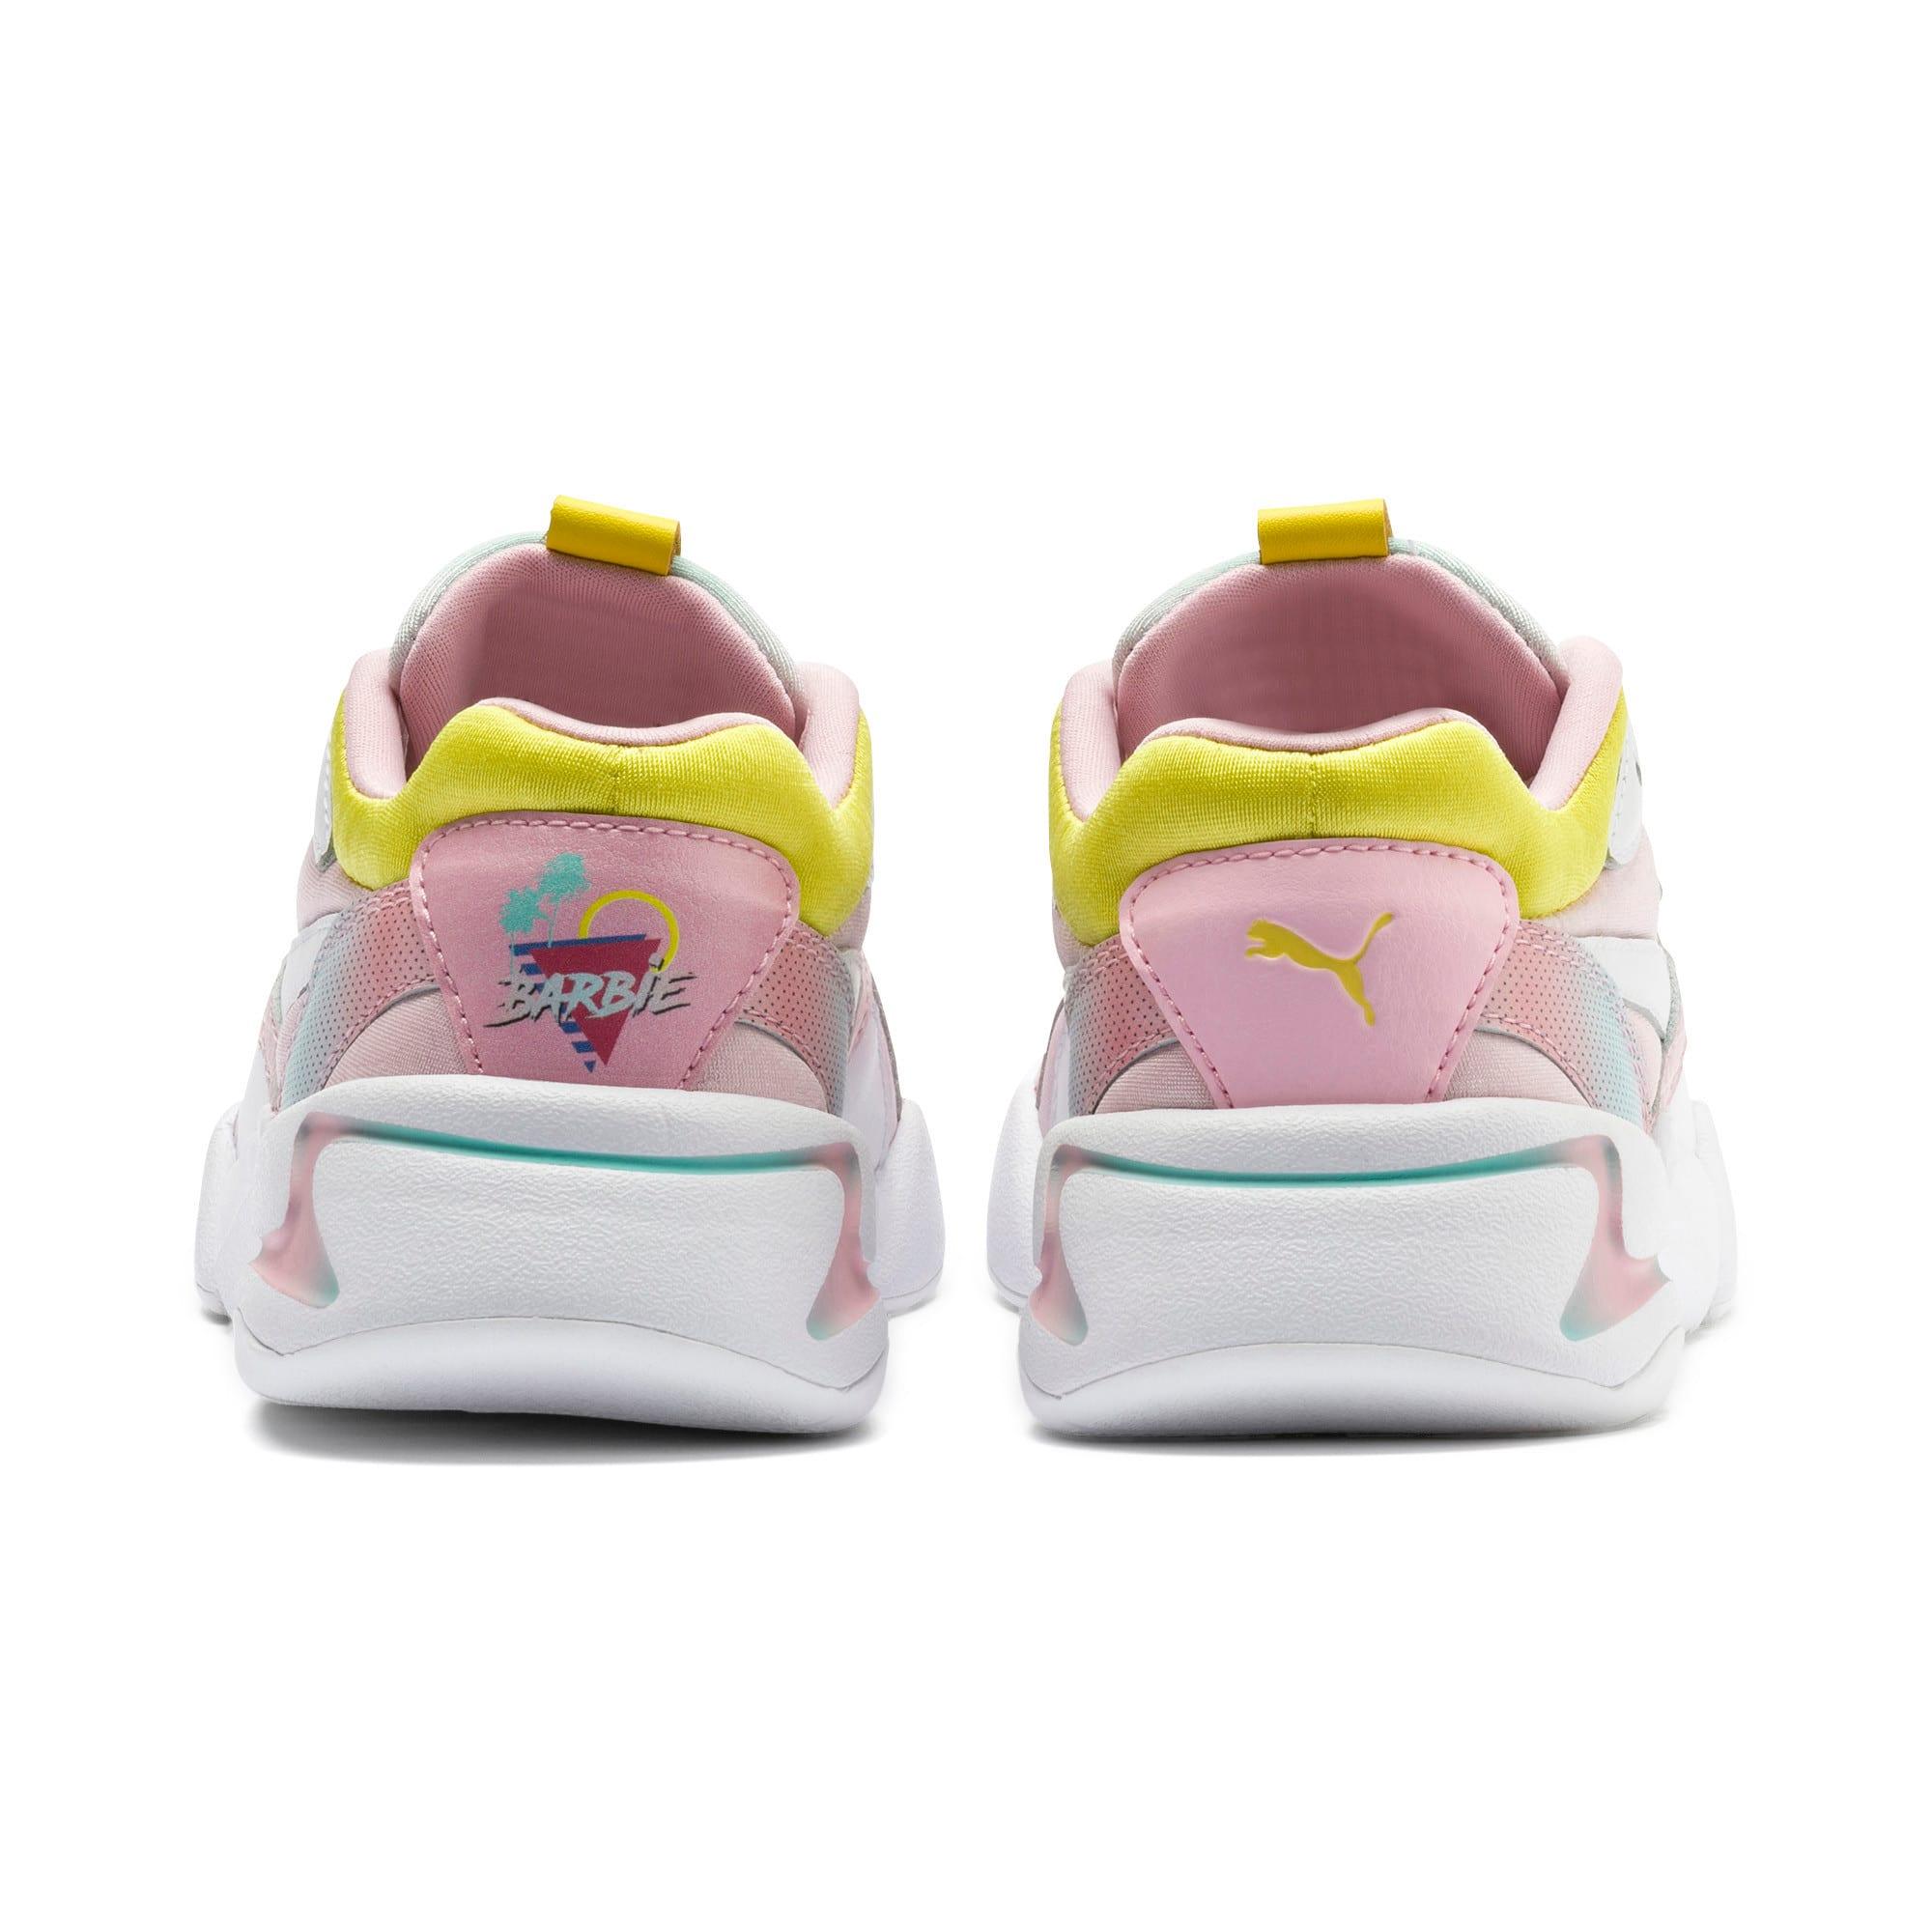 Thumbnail 3 of Nova x Barbie Little Kids' Shoes, Orchid Pink-Puma White, medium